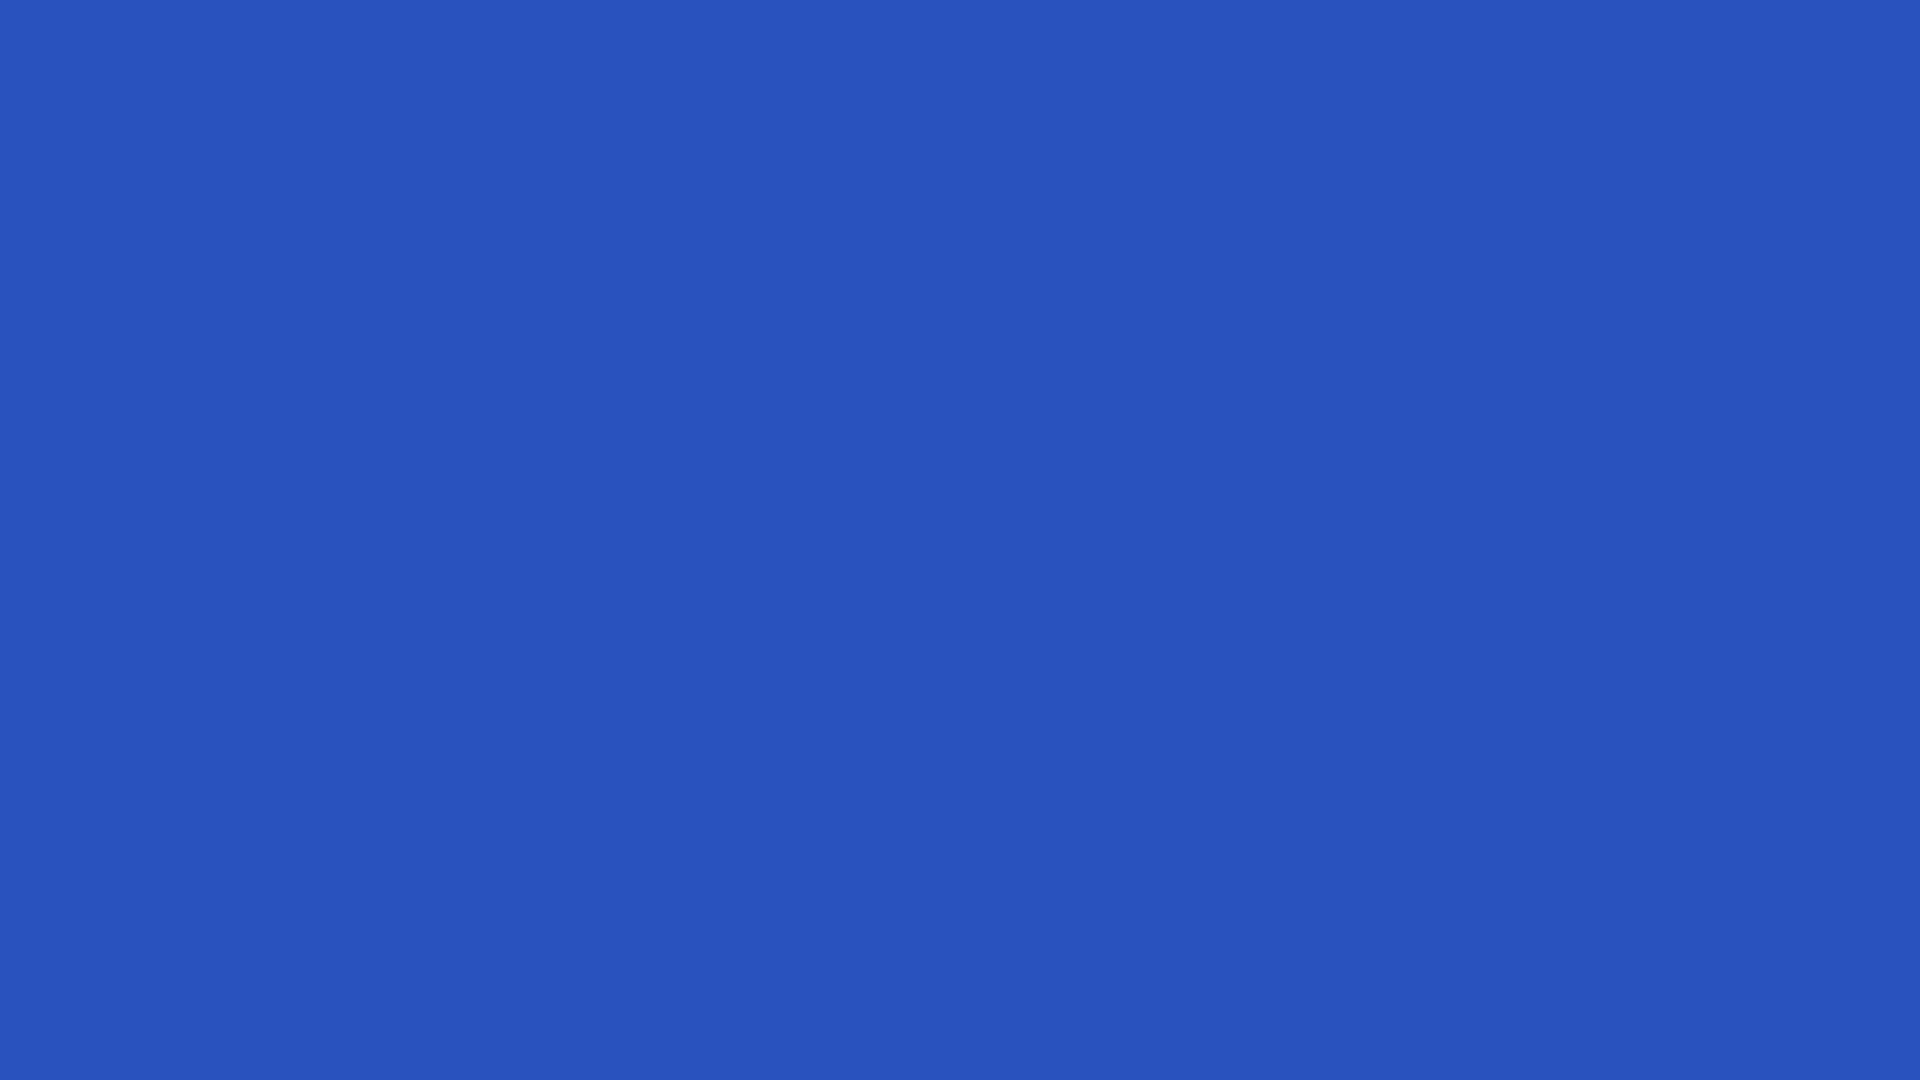 1920x1080 Cerulean Blue Solid Color Background